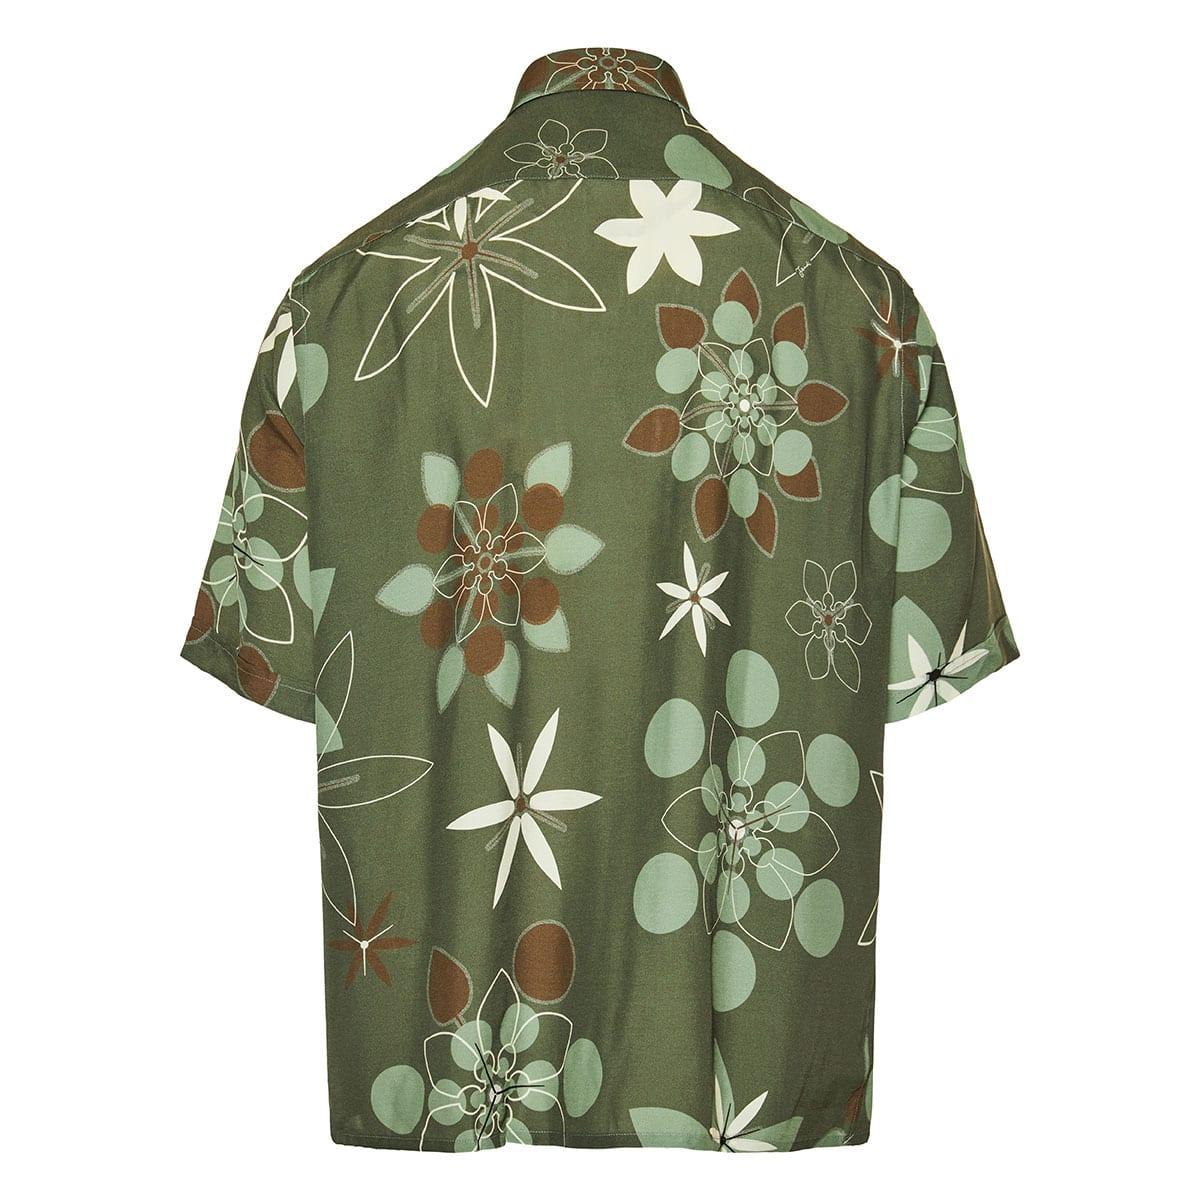 Kaleido print short-sleeved shirt